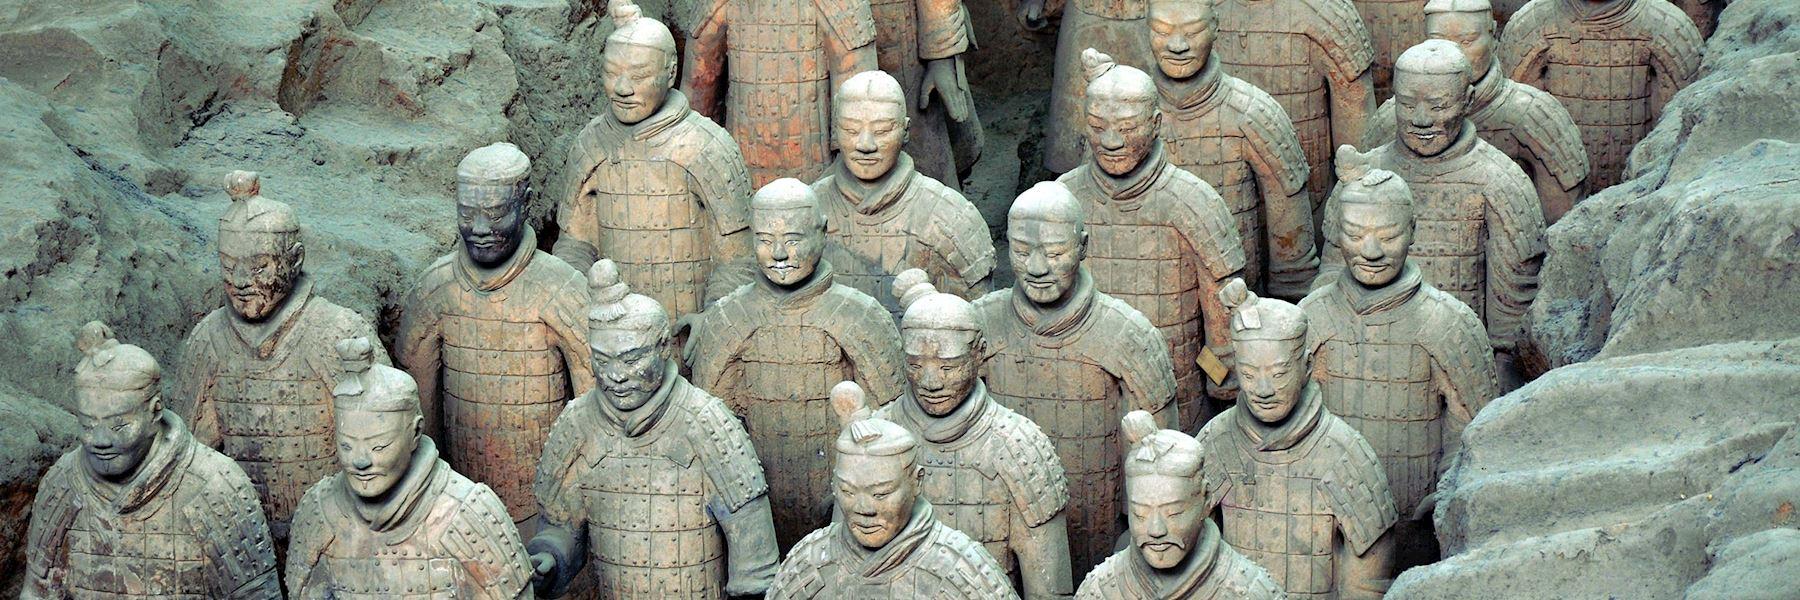 Visit Xian, China